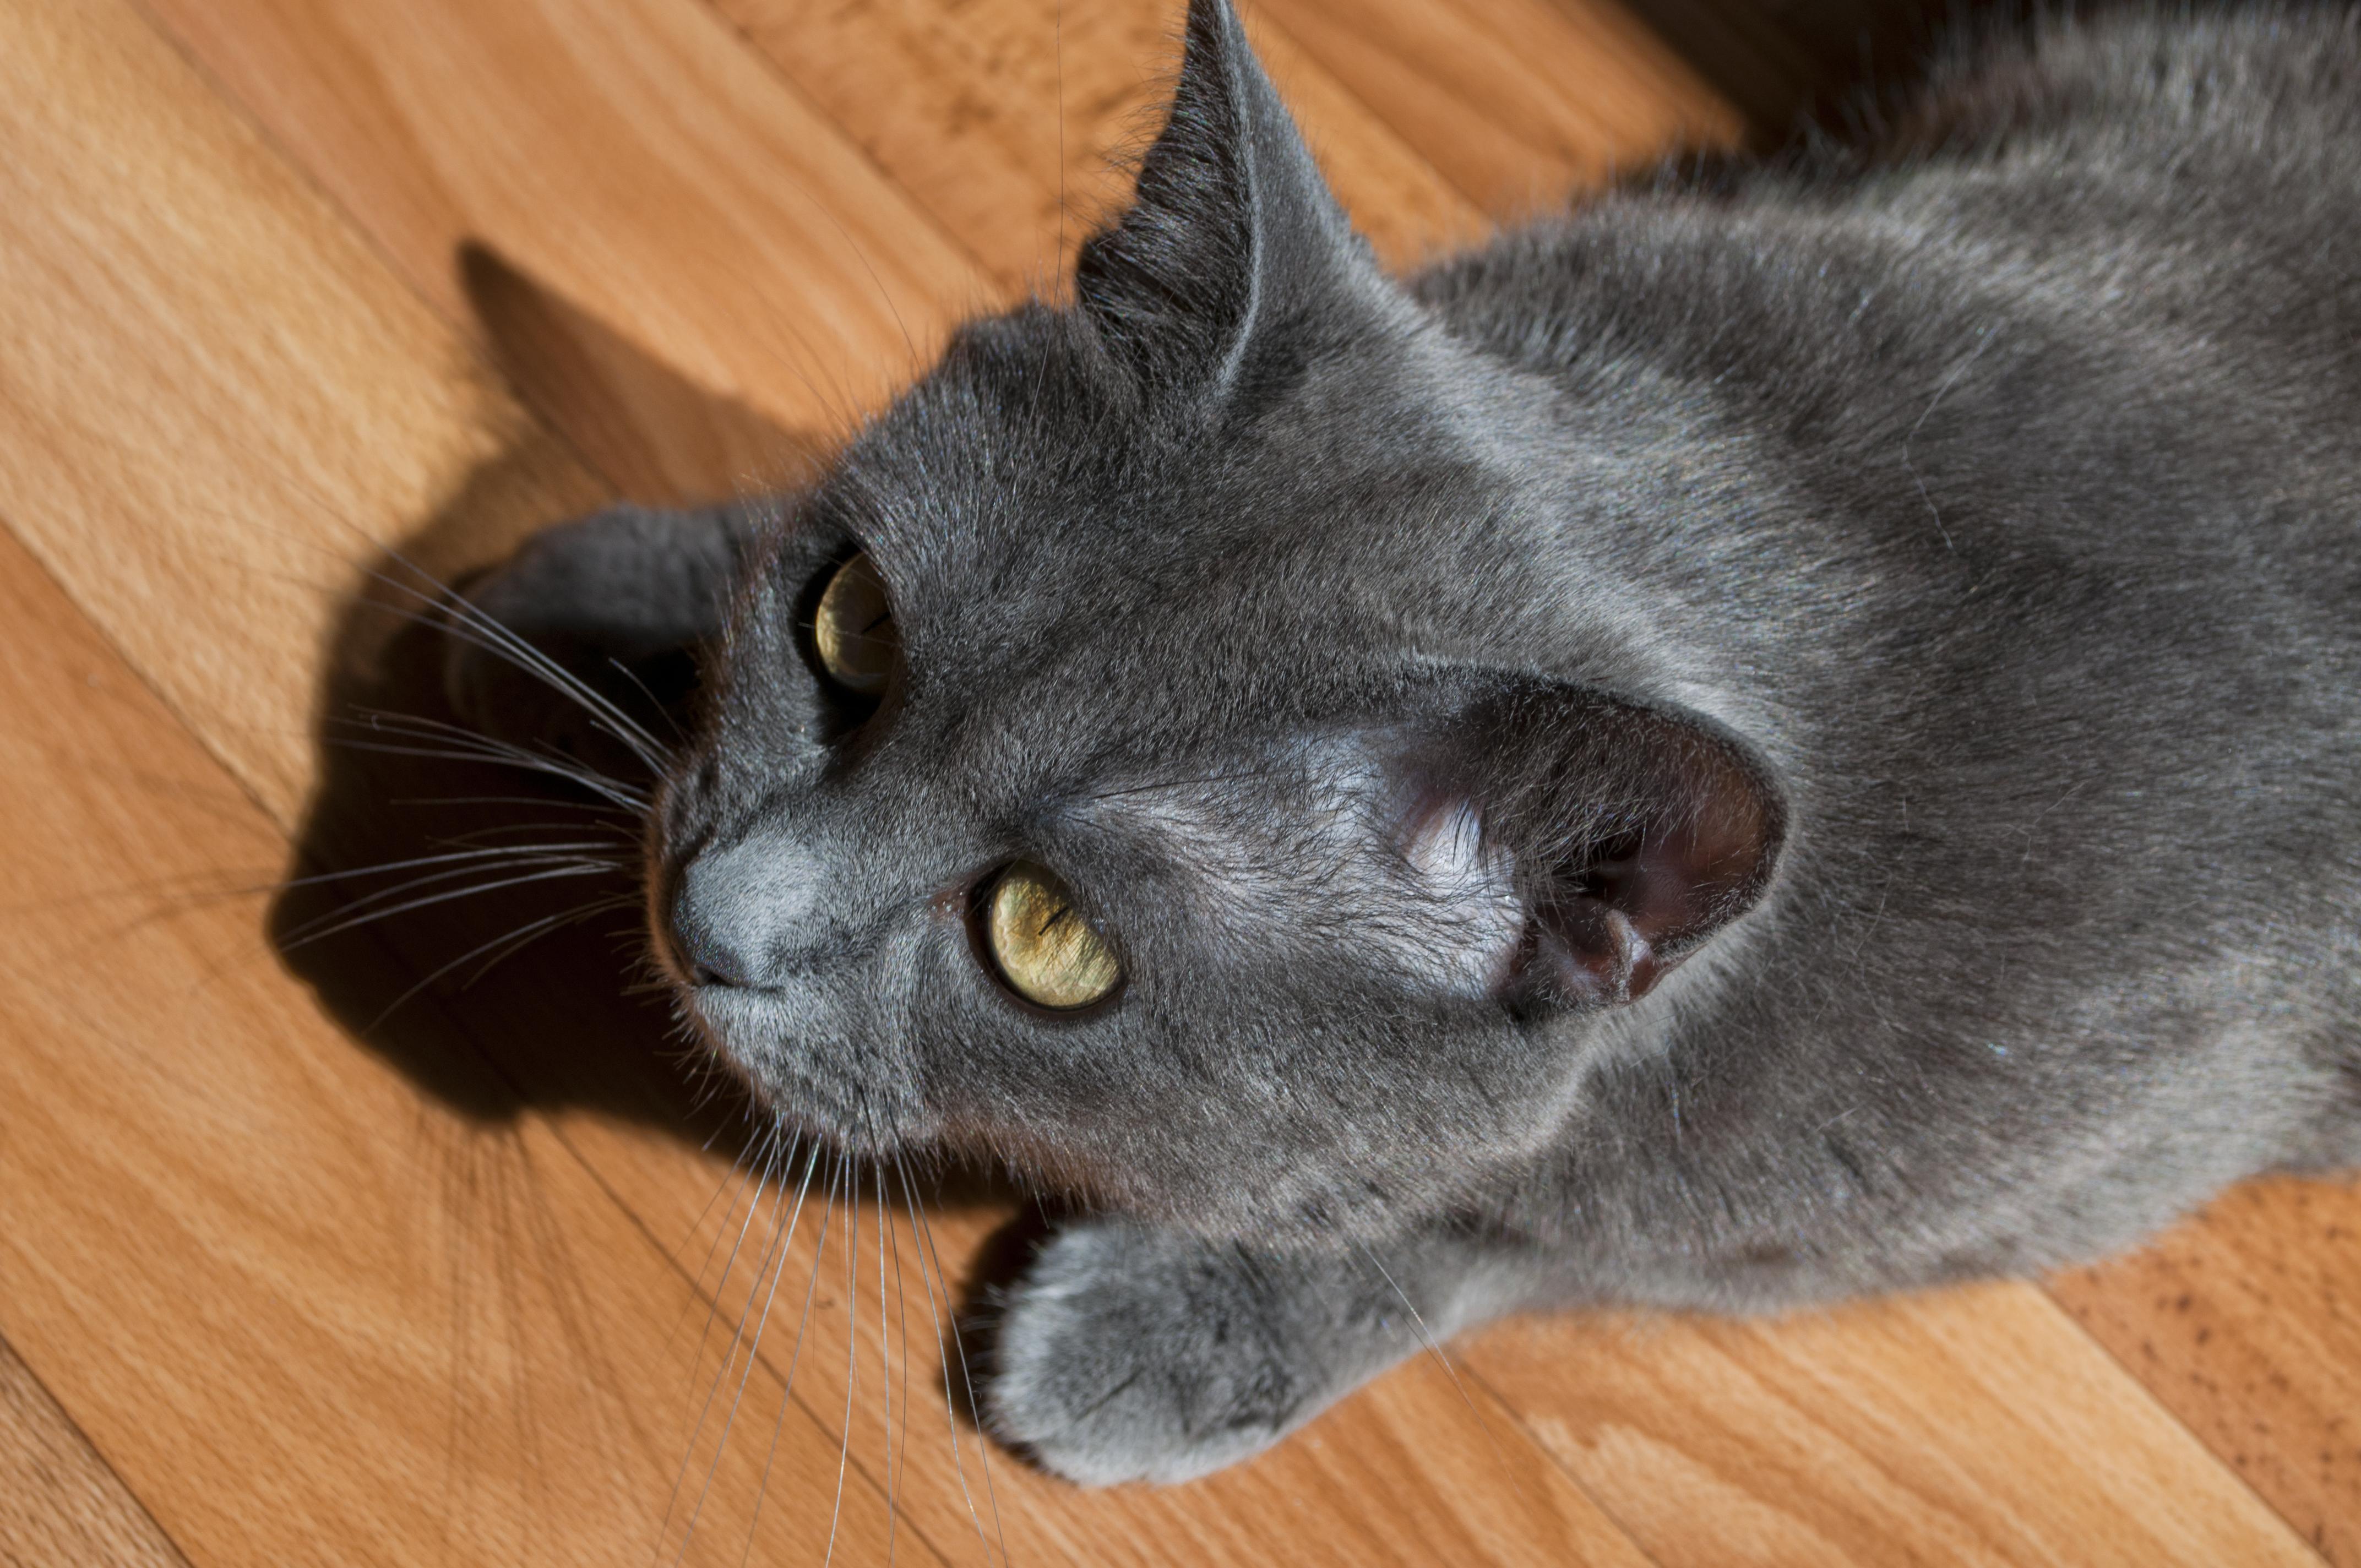 Gray cat, Animal, Cat, Fur, Gray, HQ Photo